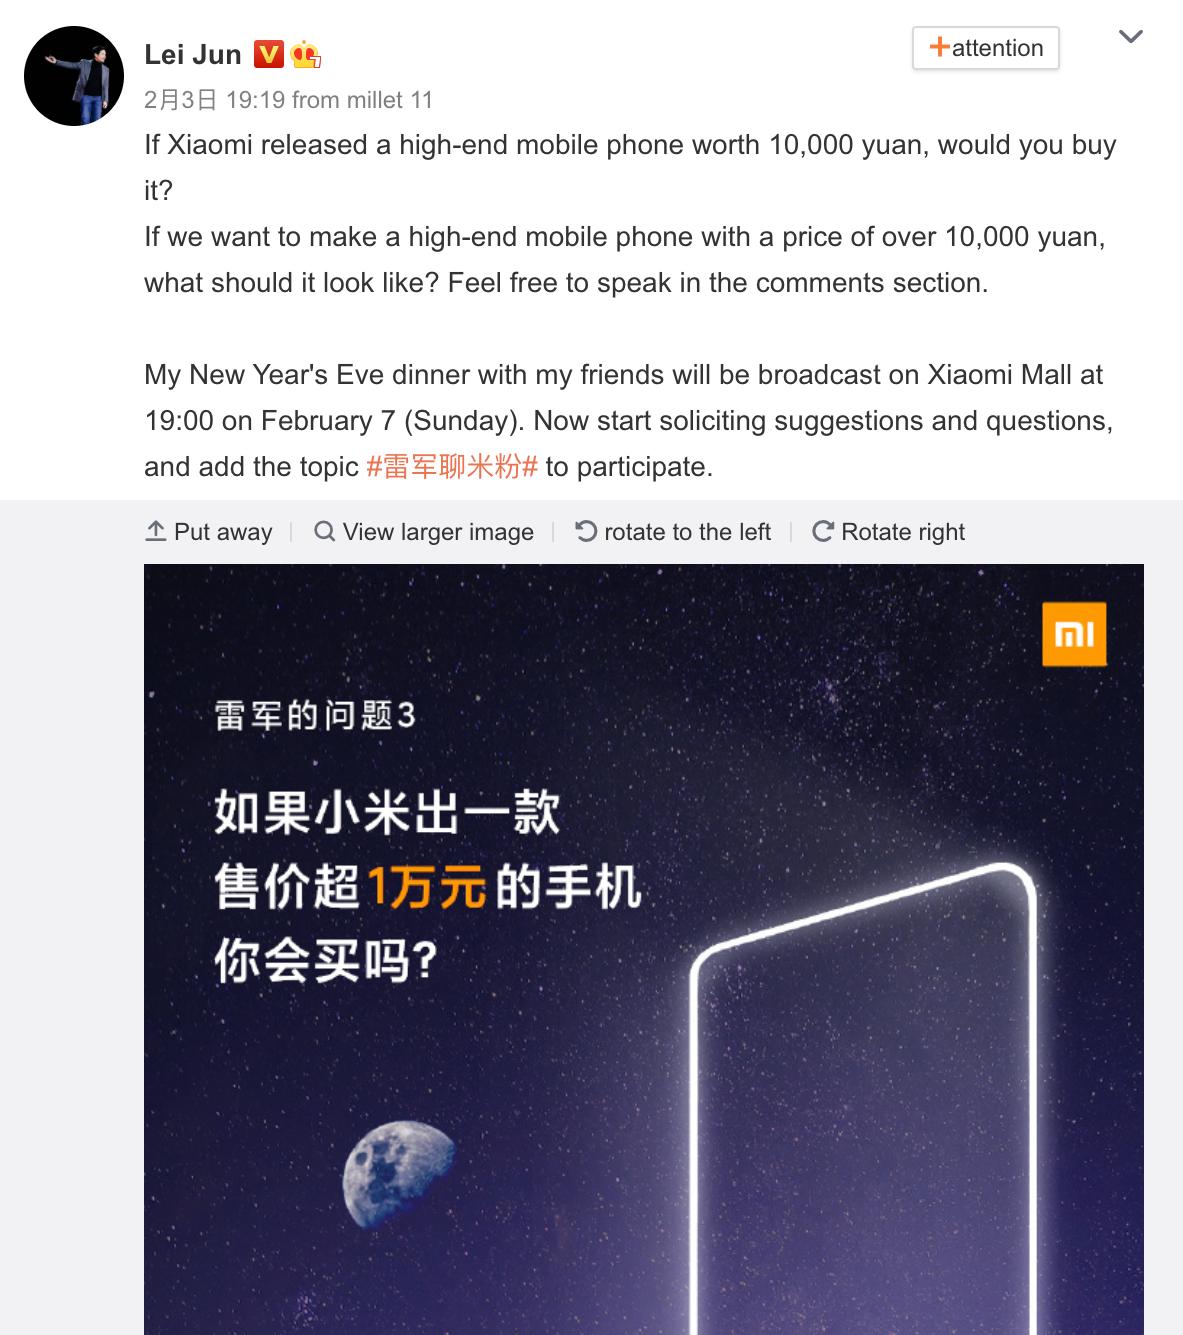 Xiaomi 1500 dollar phone weibo post